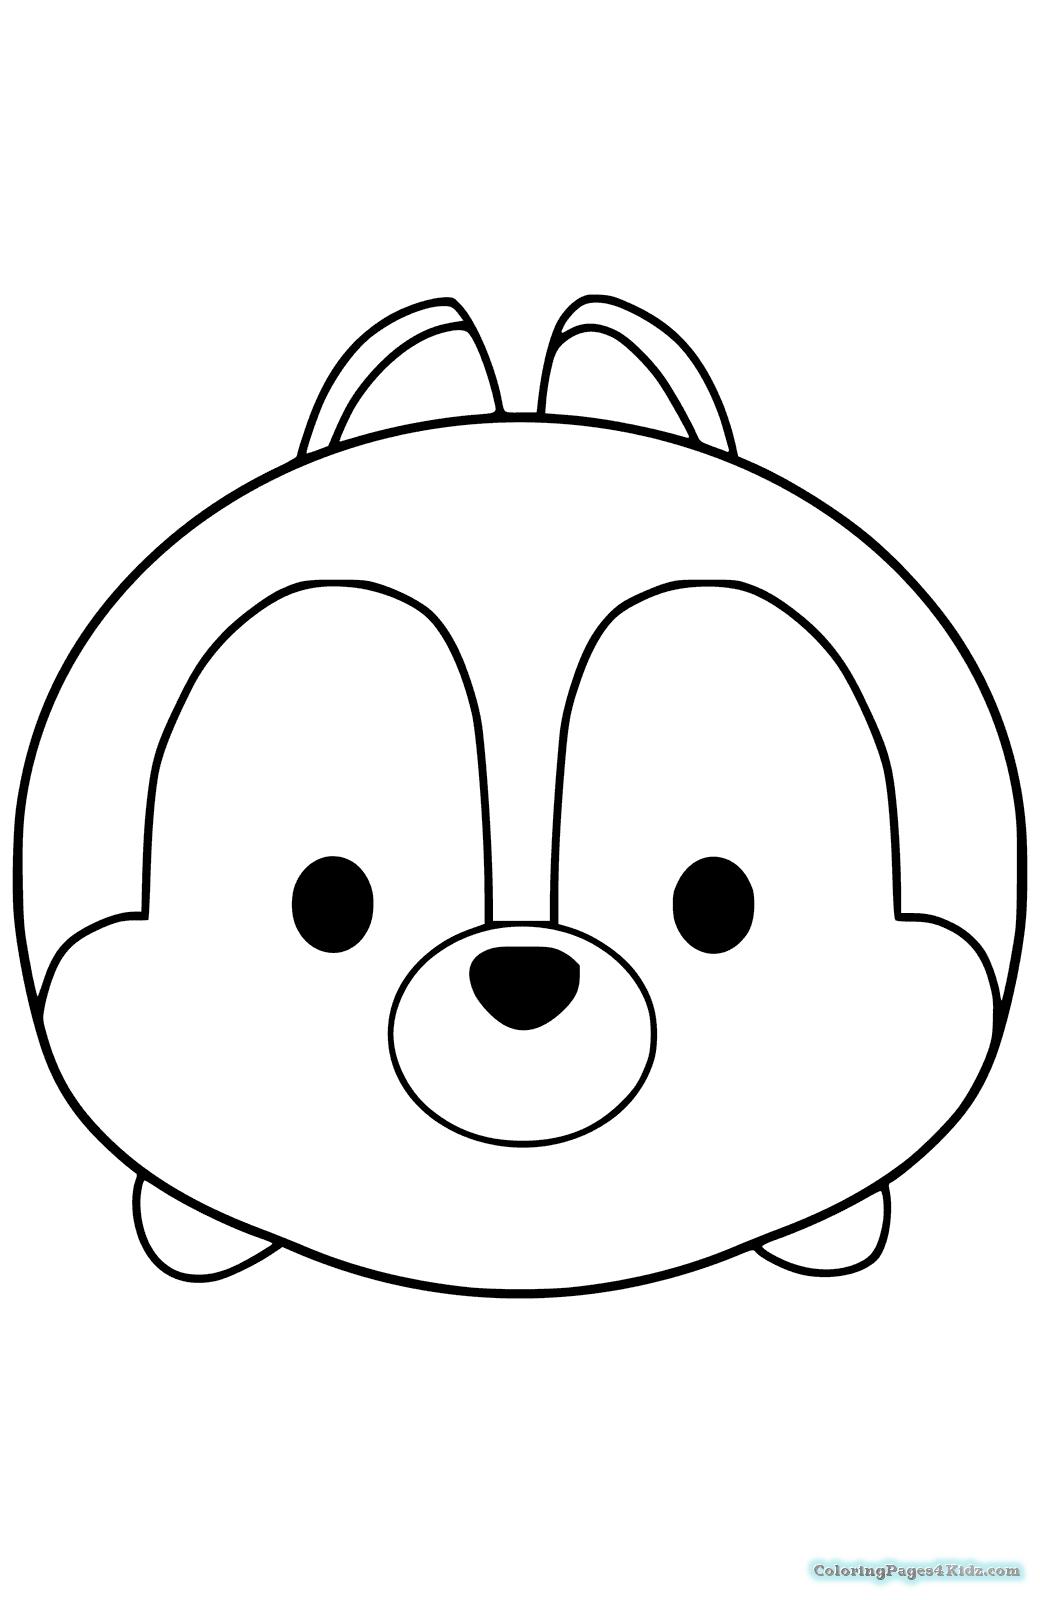 Disney Tsum Tsum Coloring Pages At Getdrawings